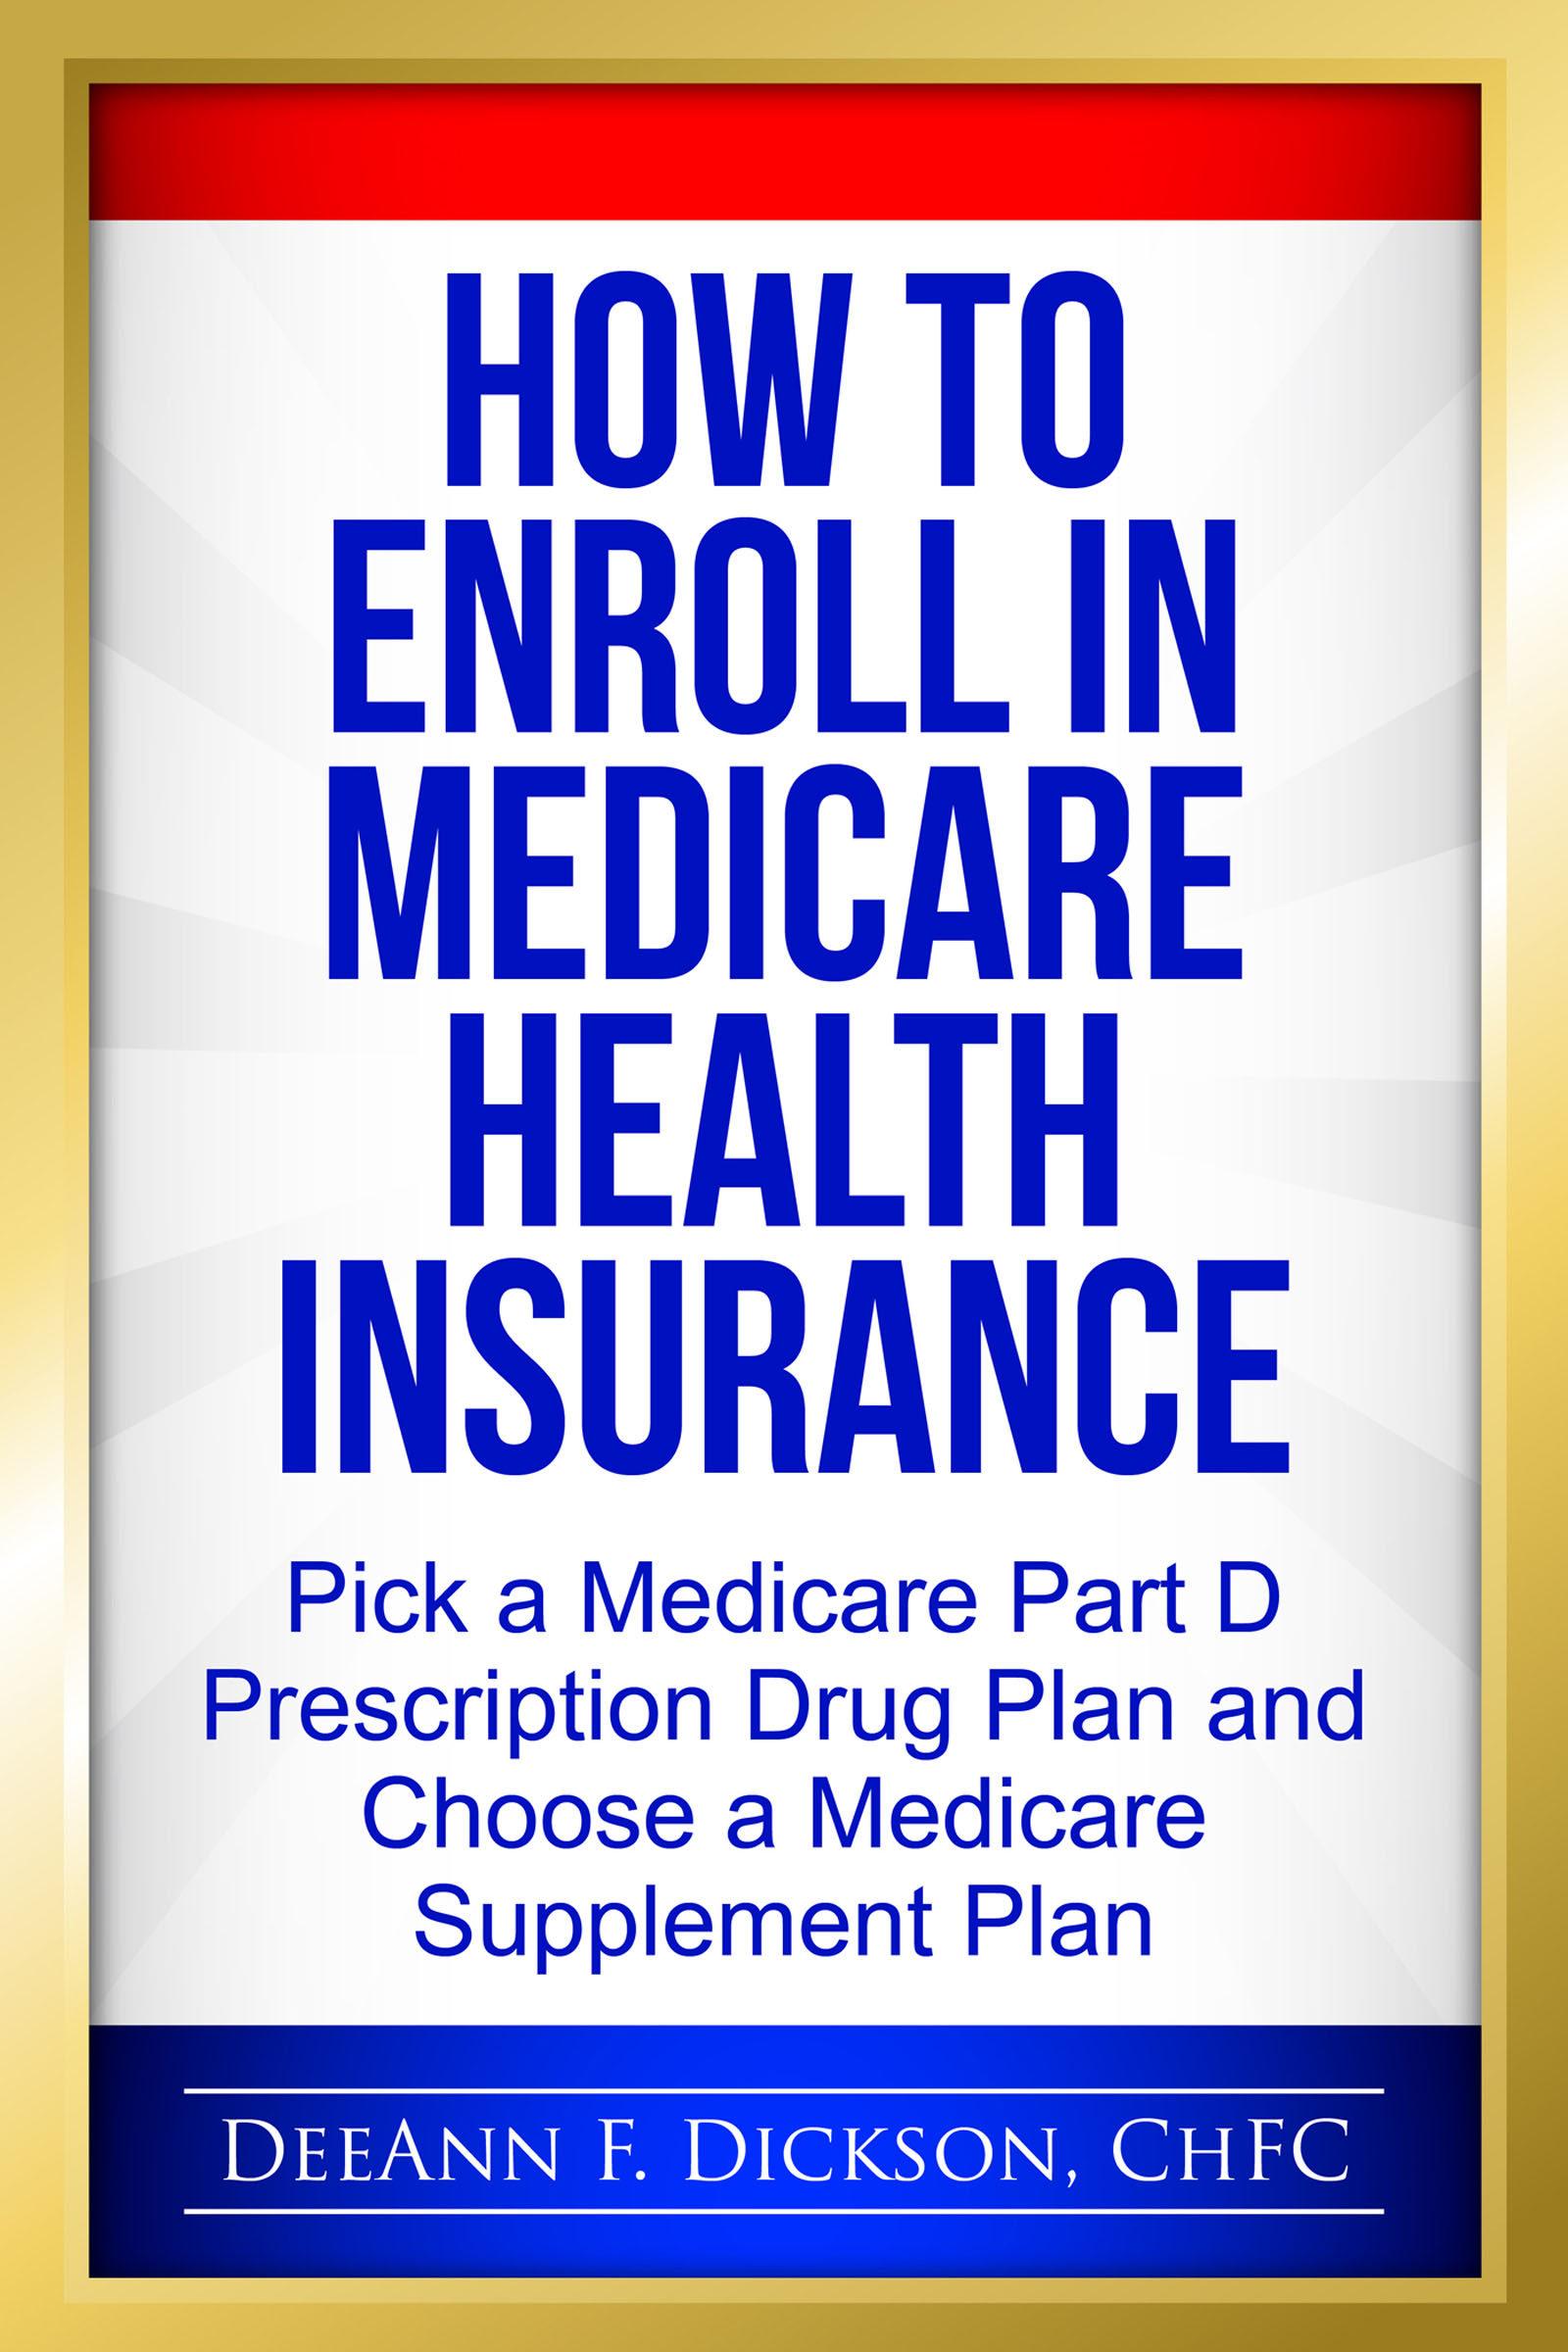 How To Enroll In Medicare Health Insurance (ebook) · Ebooks · El Corte  Inglés